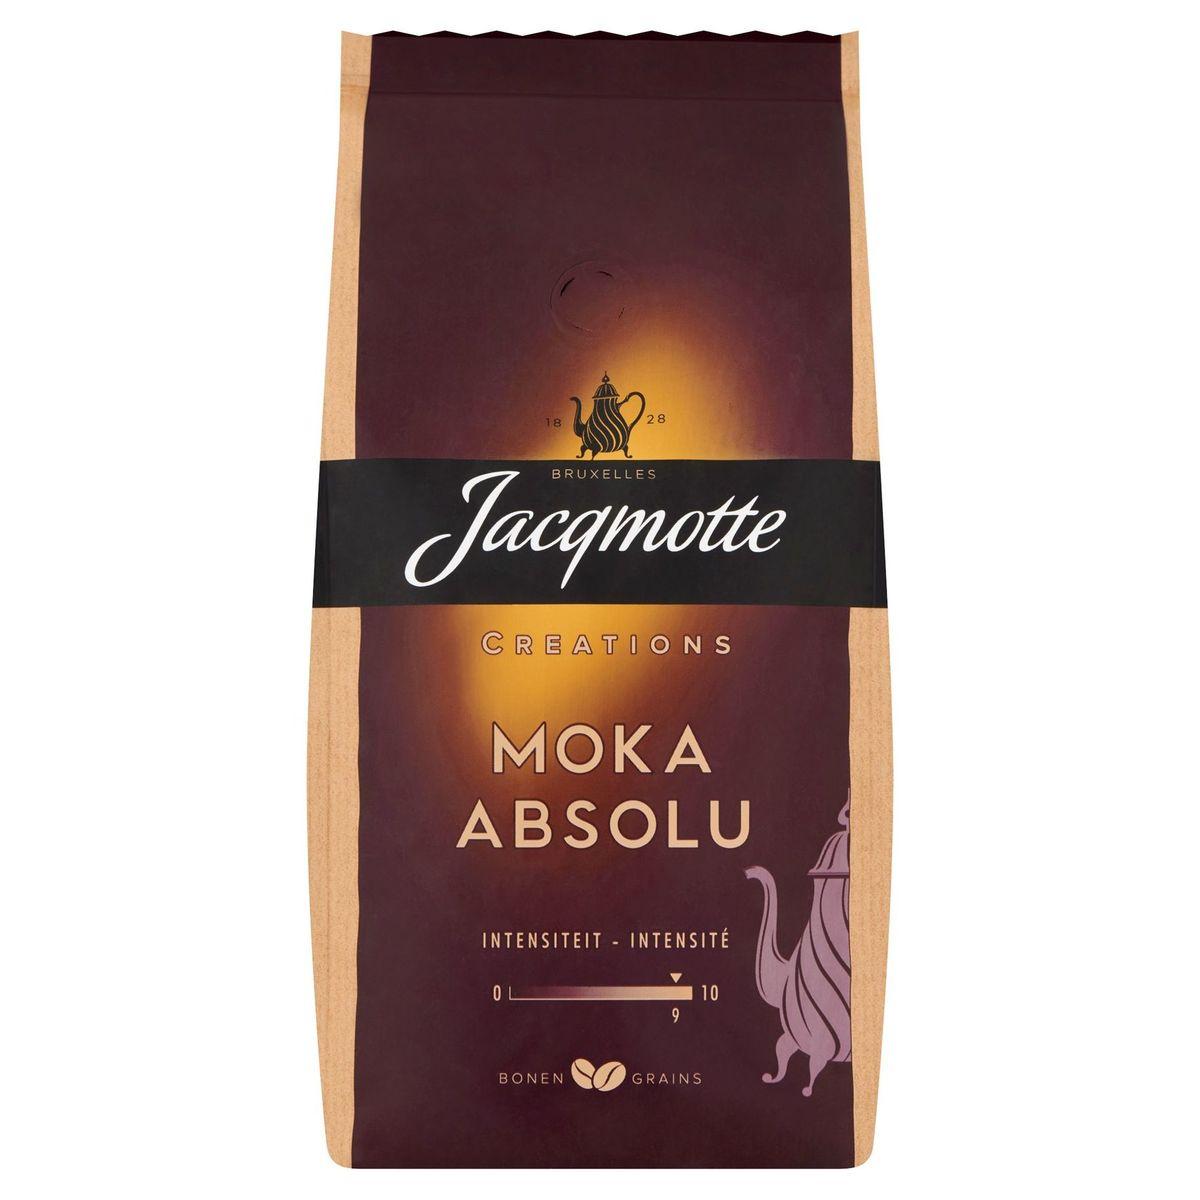 JACQMOTTE Café Grains  Moka Absolu 500g